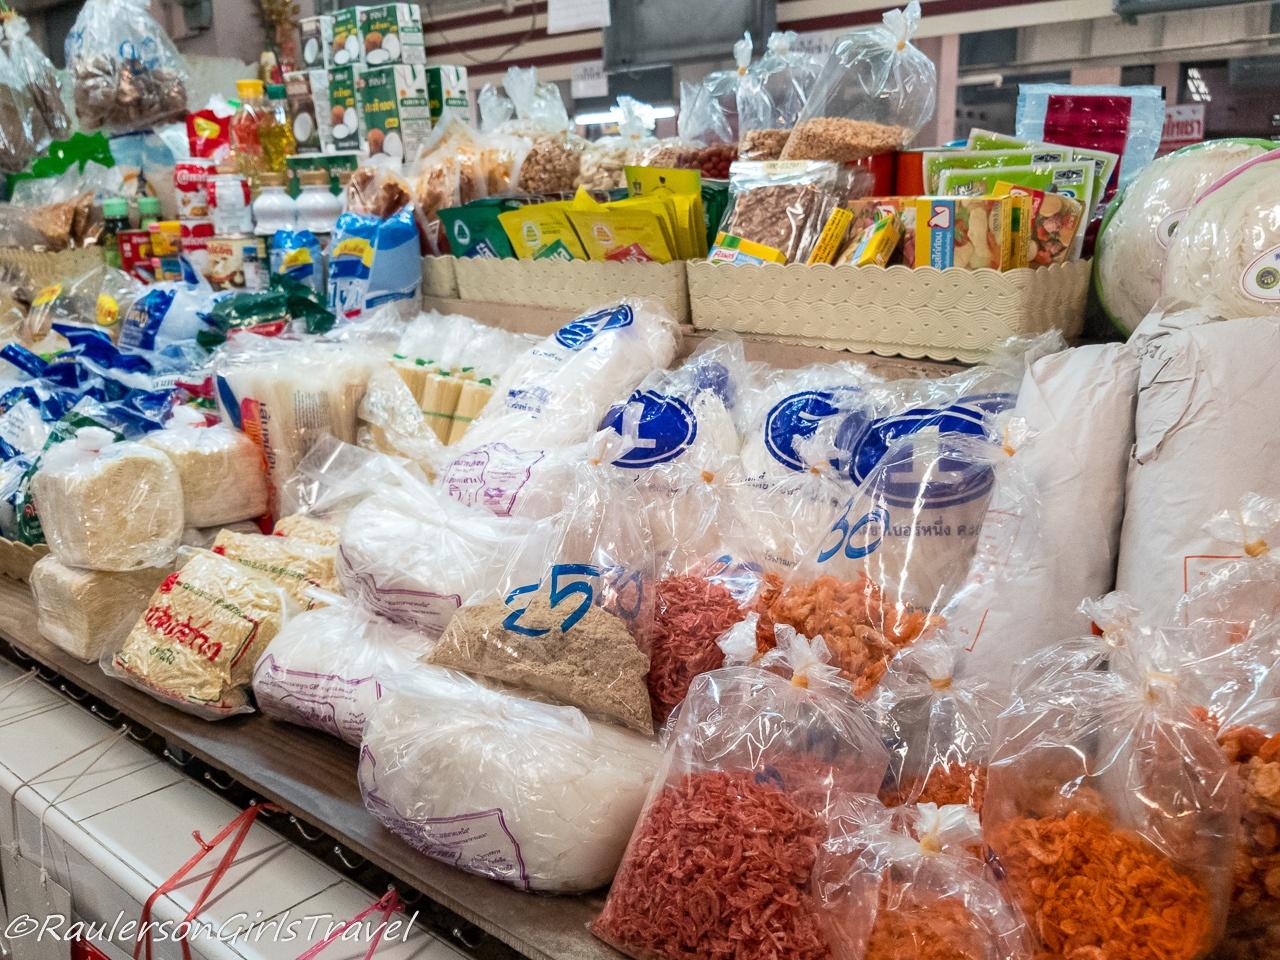 Bagged food in Thai market